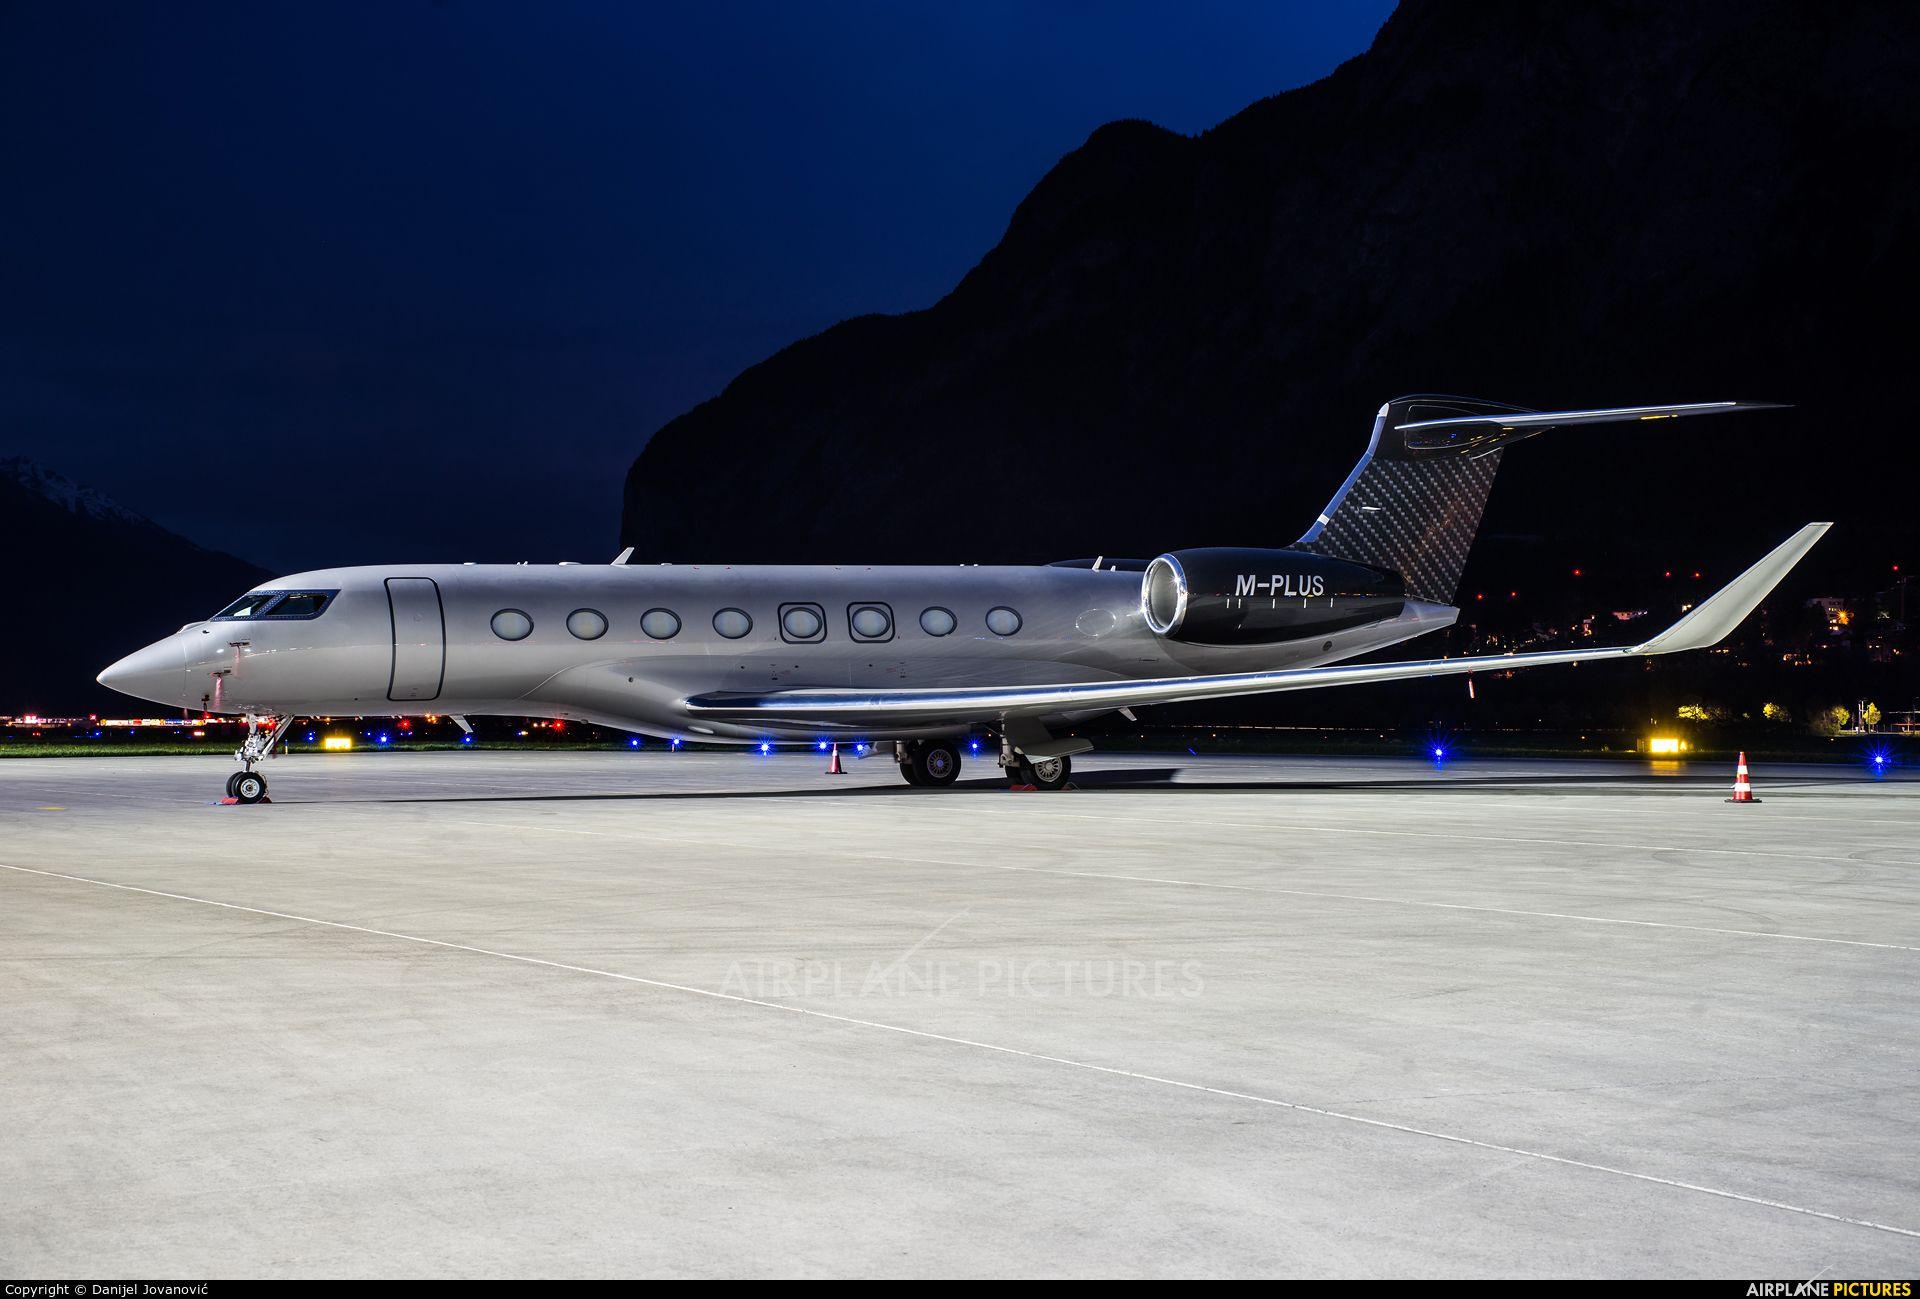 Gulfstream G650er Private Jet Luxury Jets Luxury Private Jets